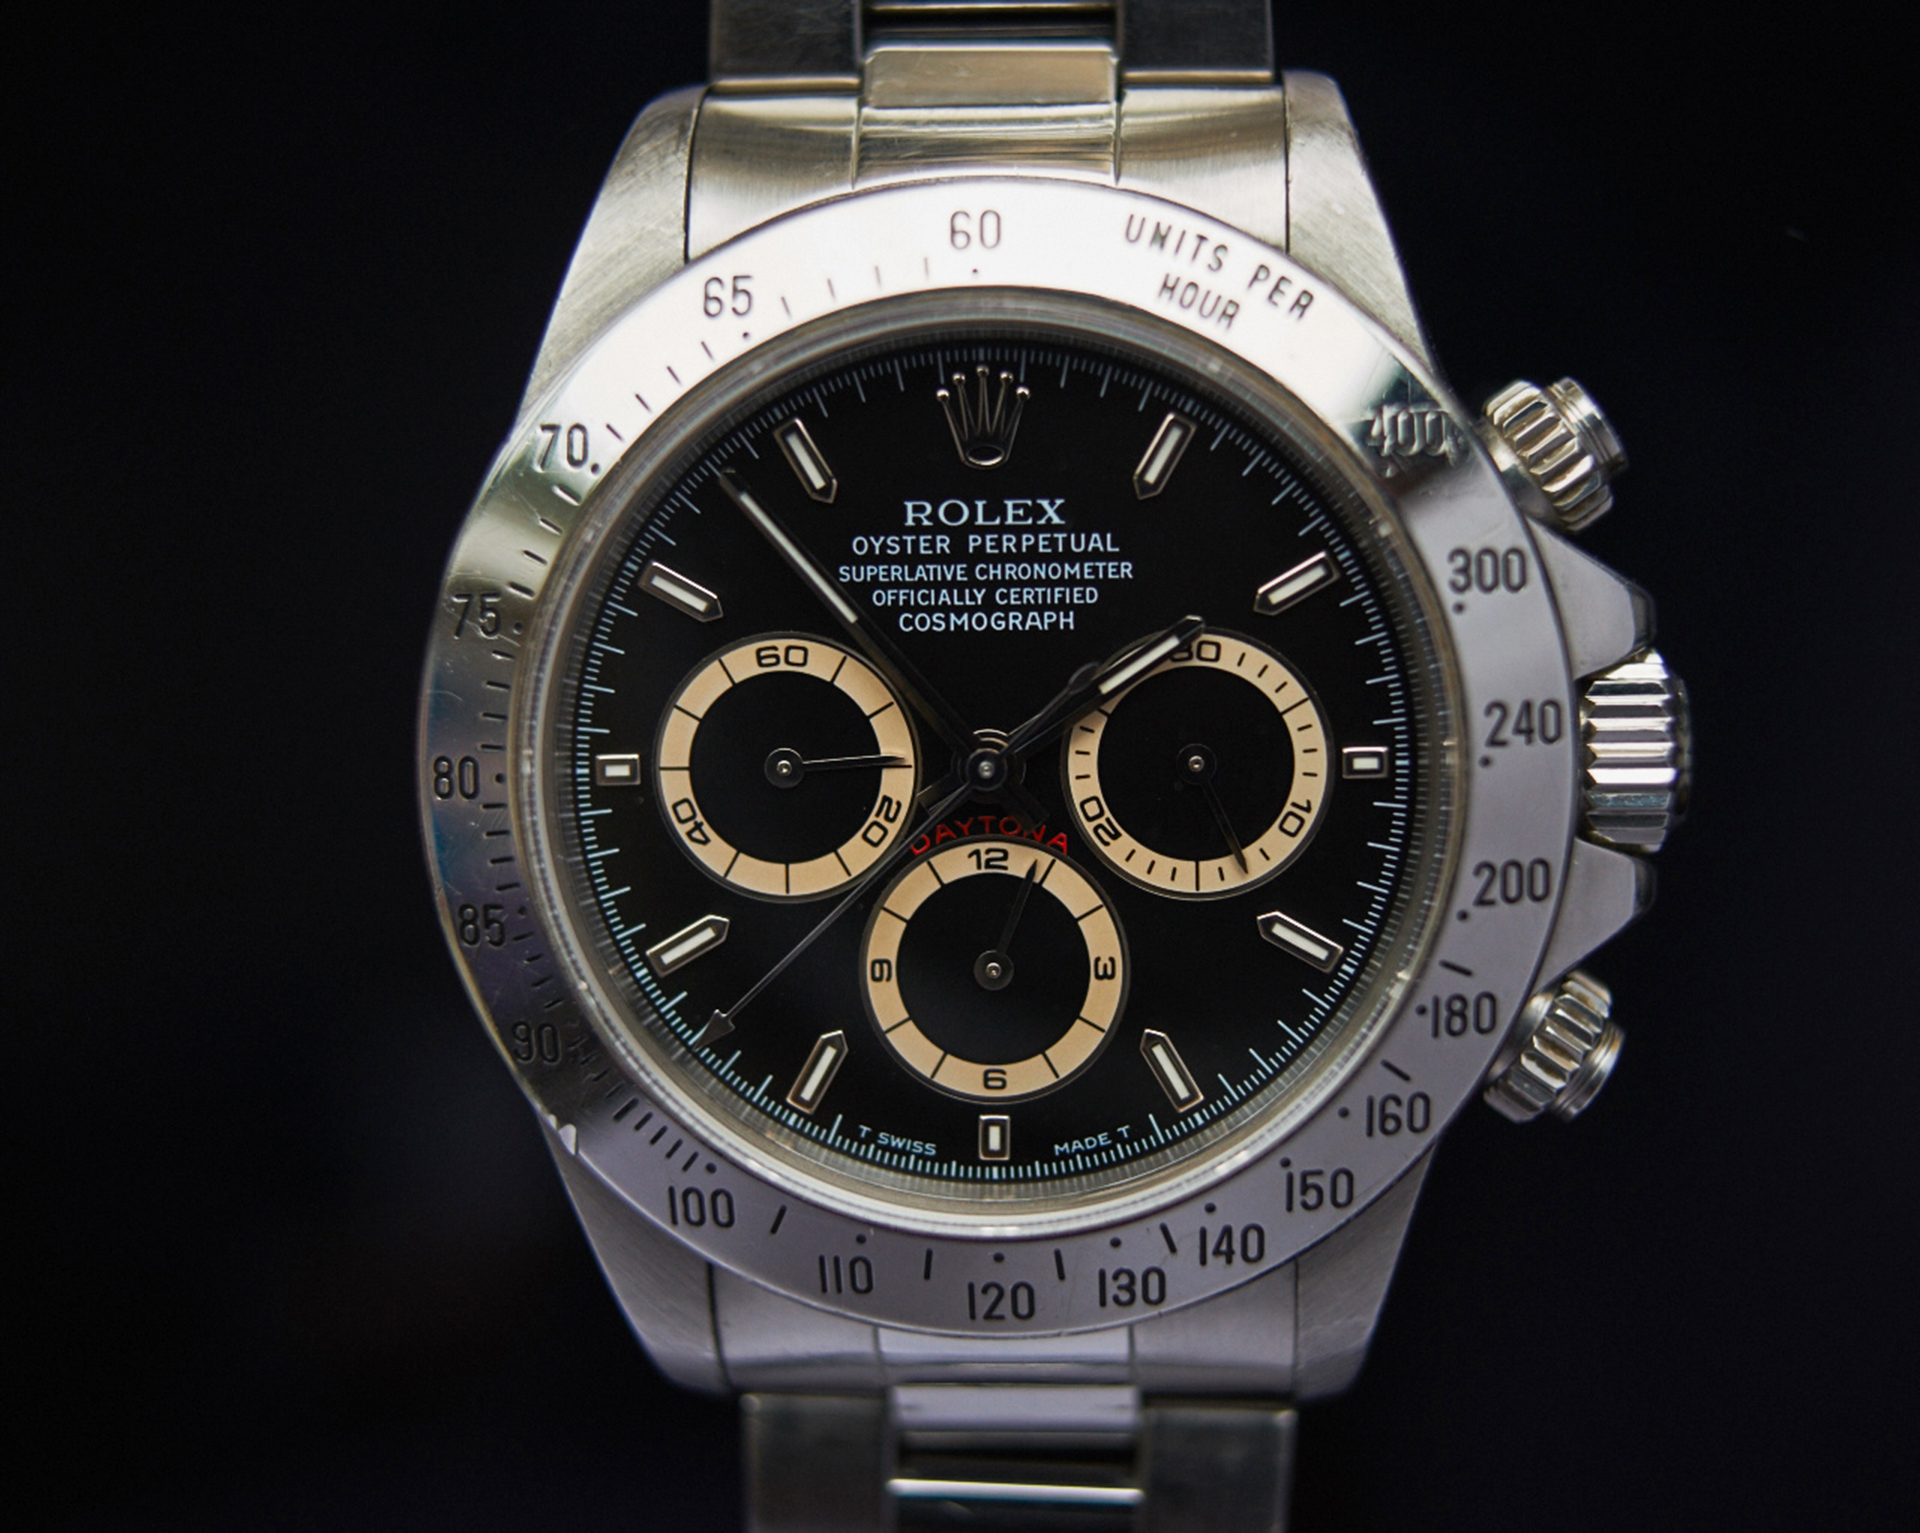 Rolex Daytona 16520 brownish subs